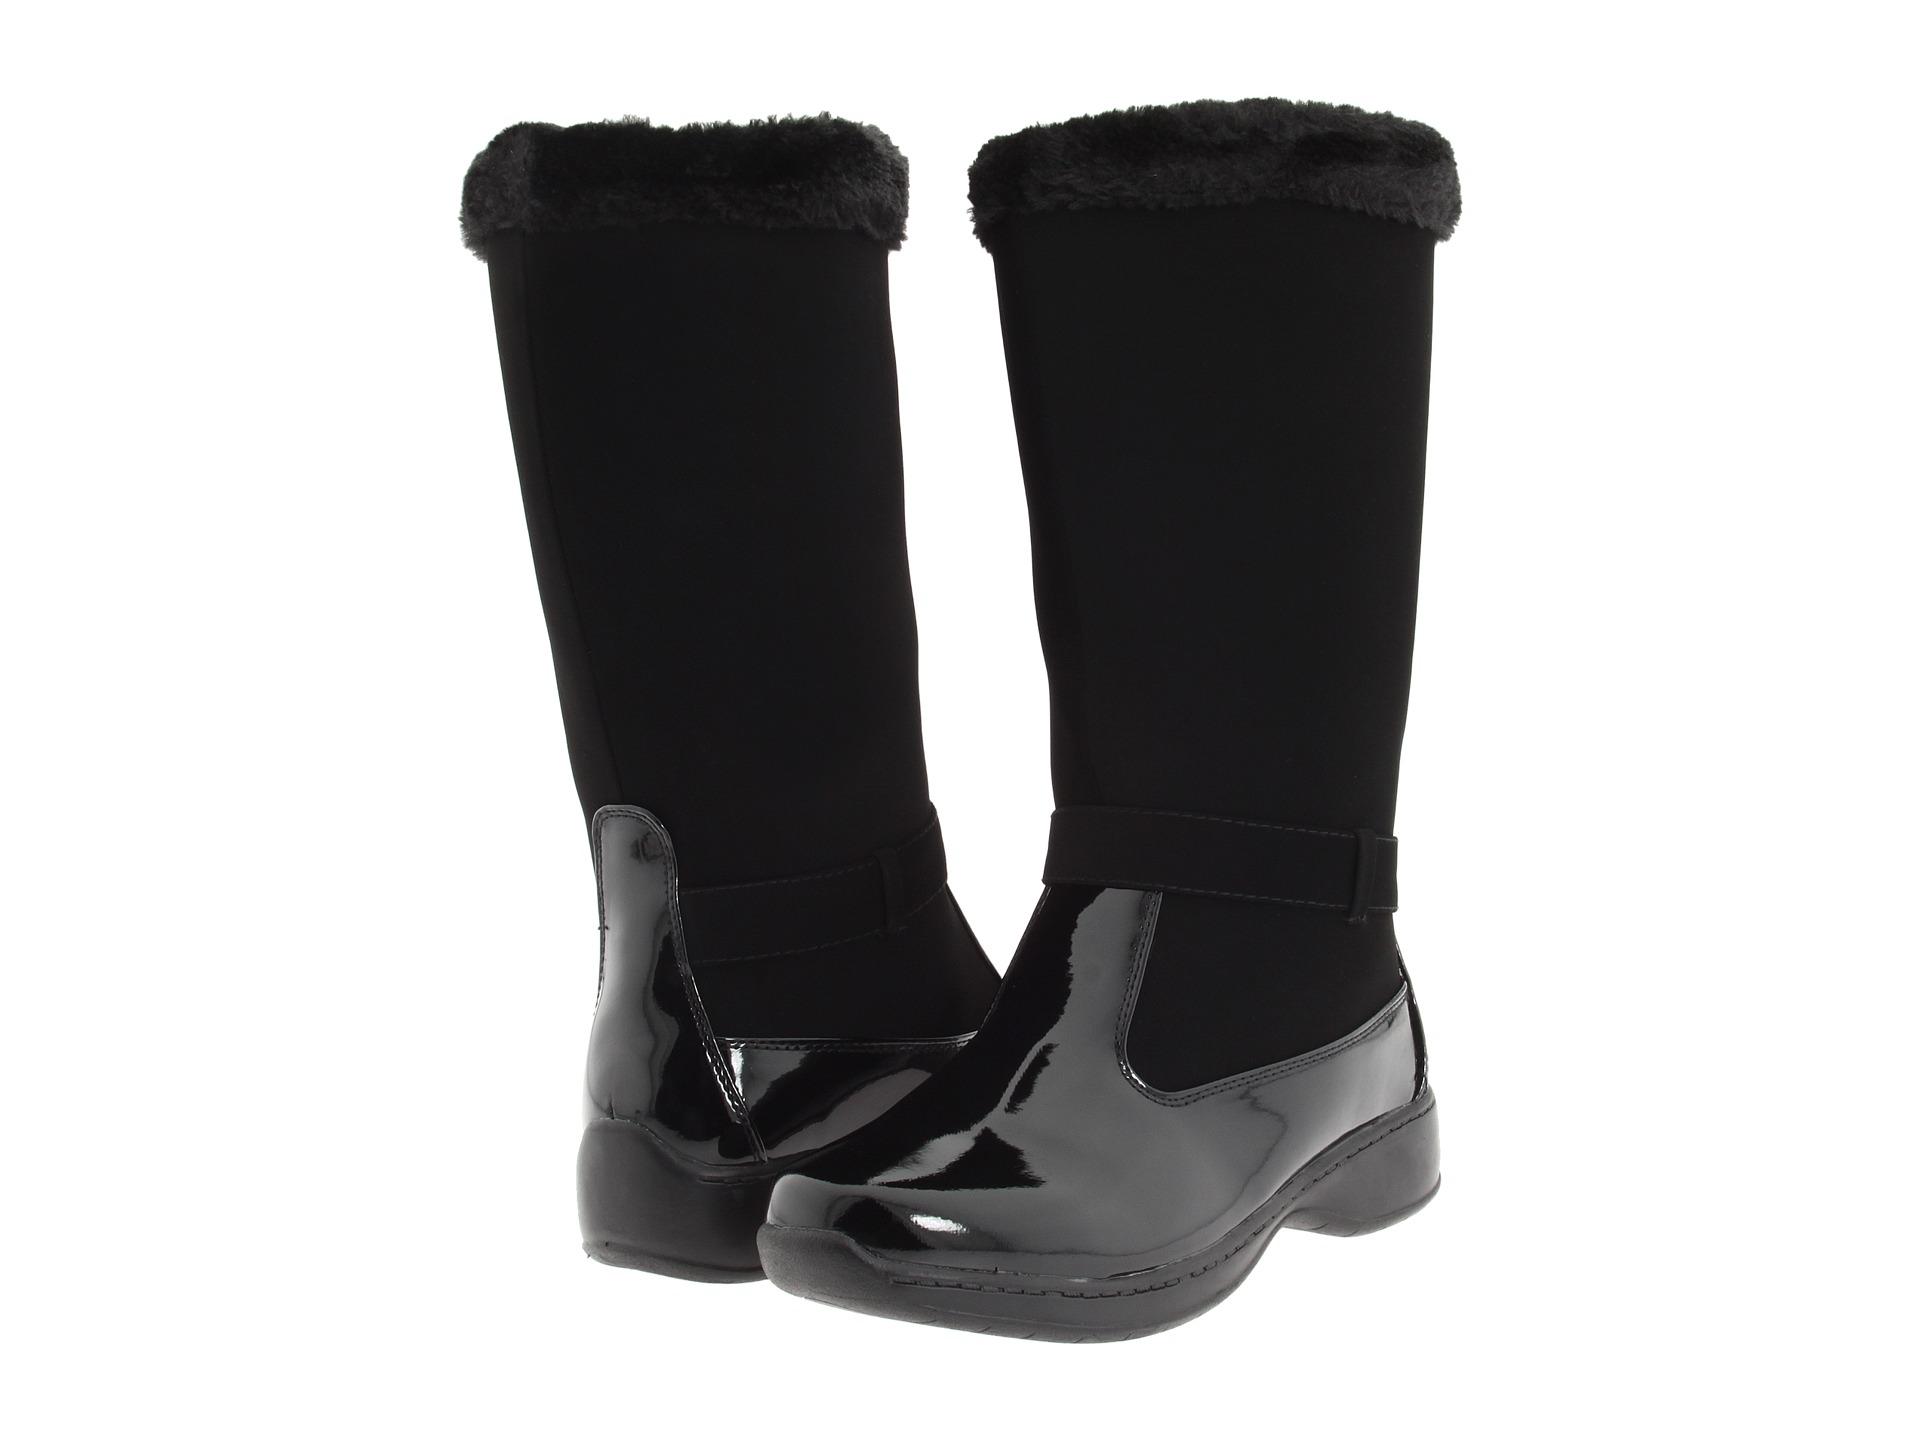 tundra boots at zappos